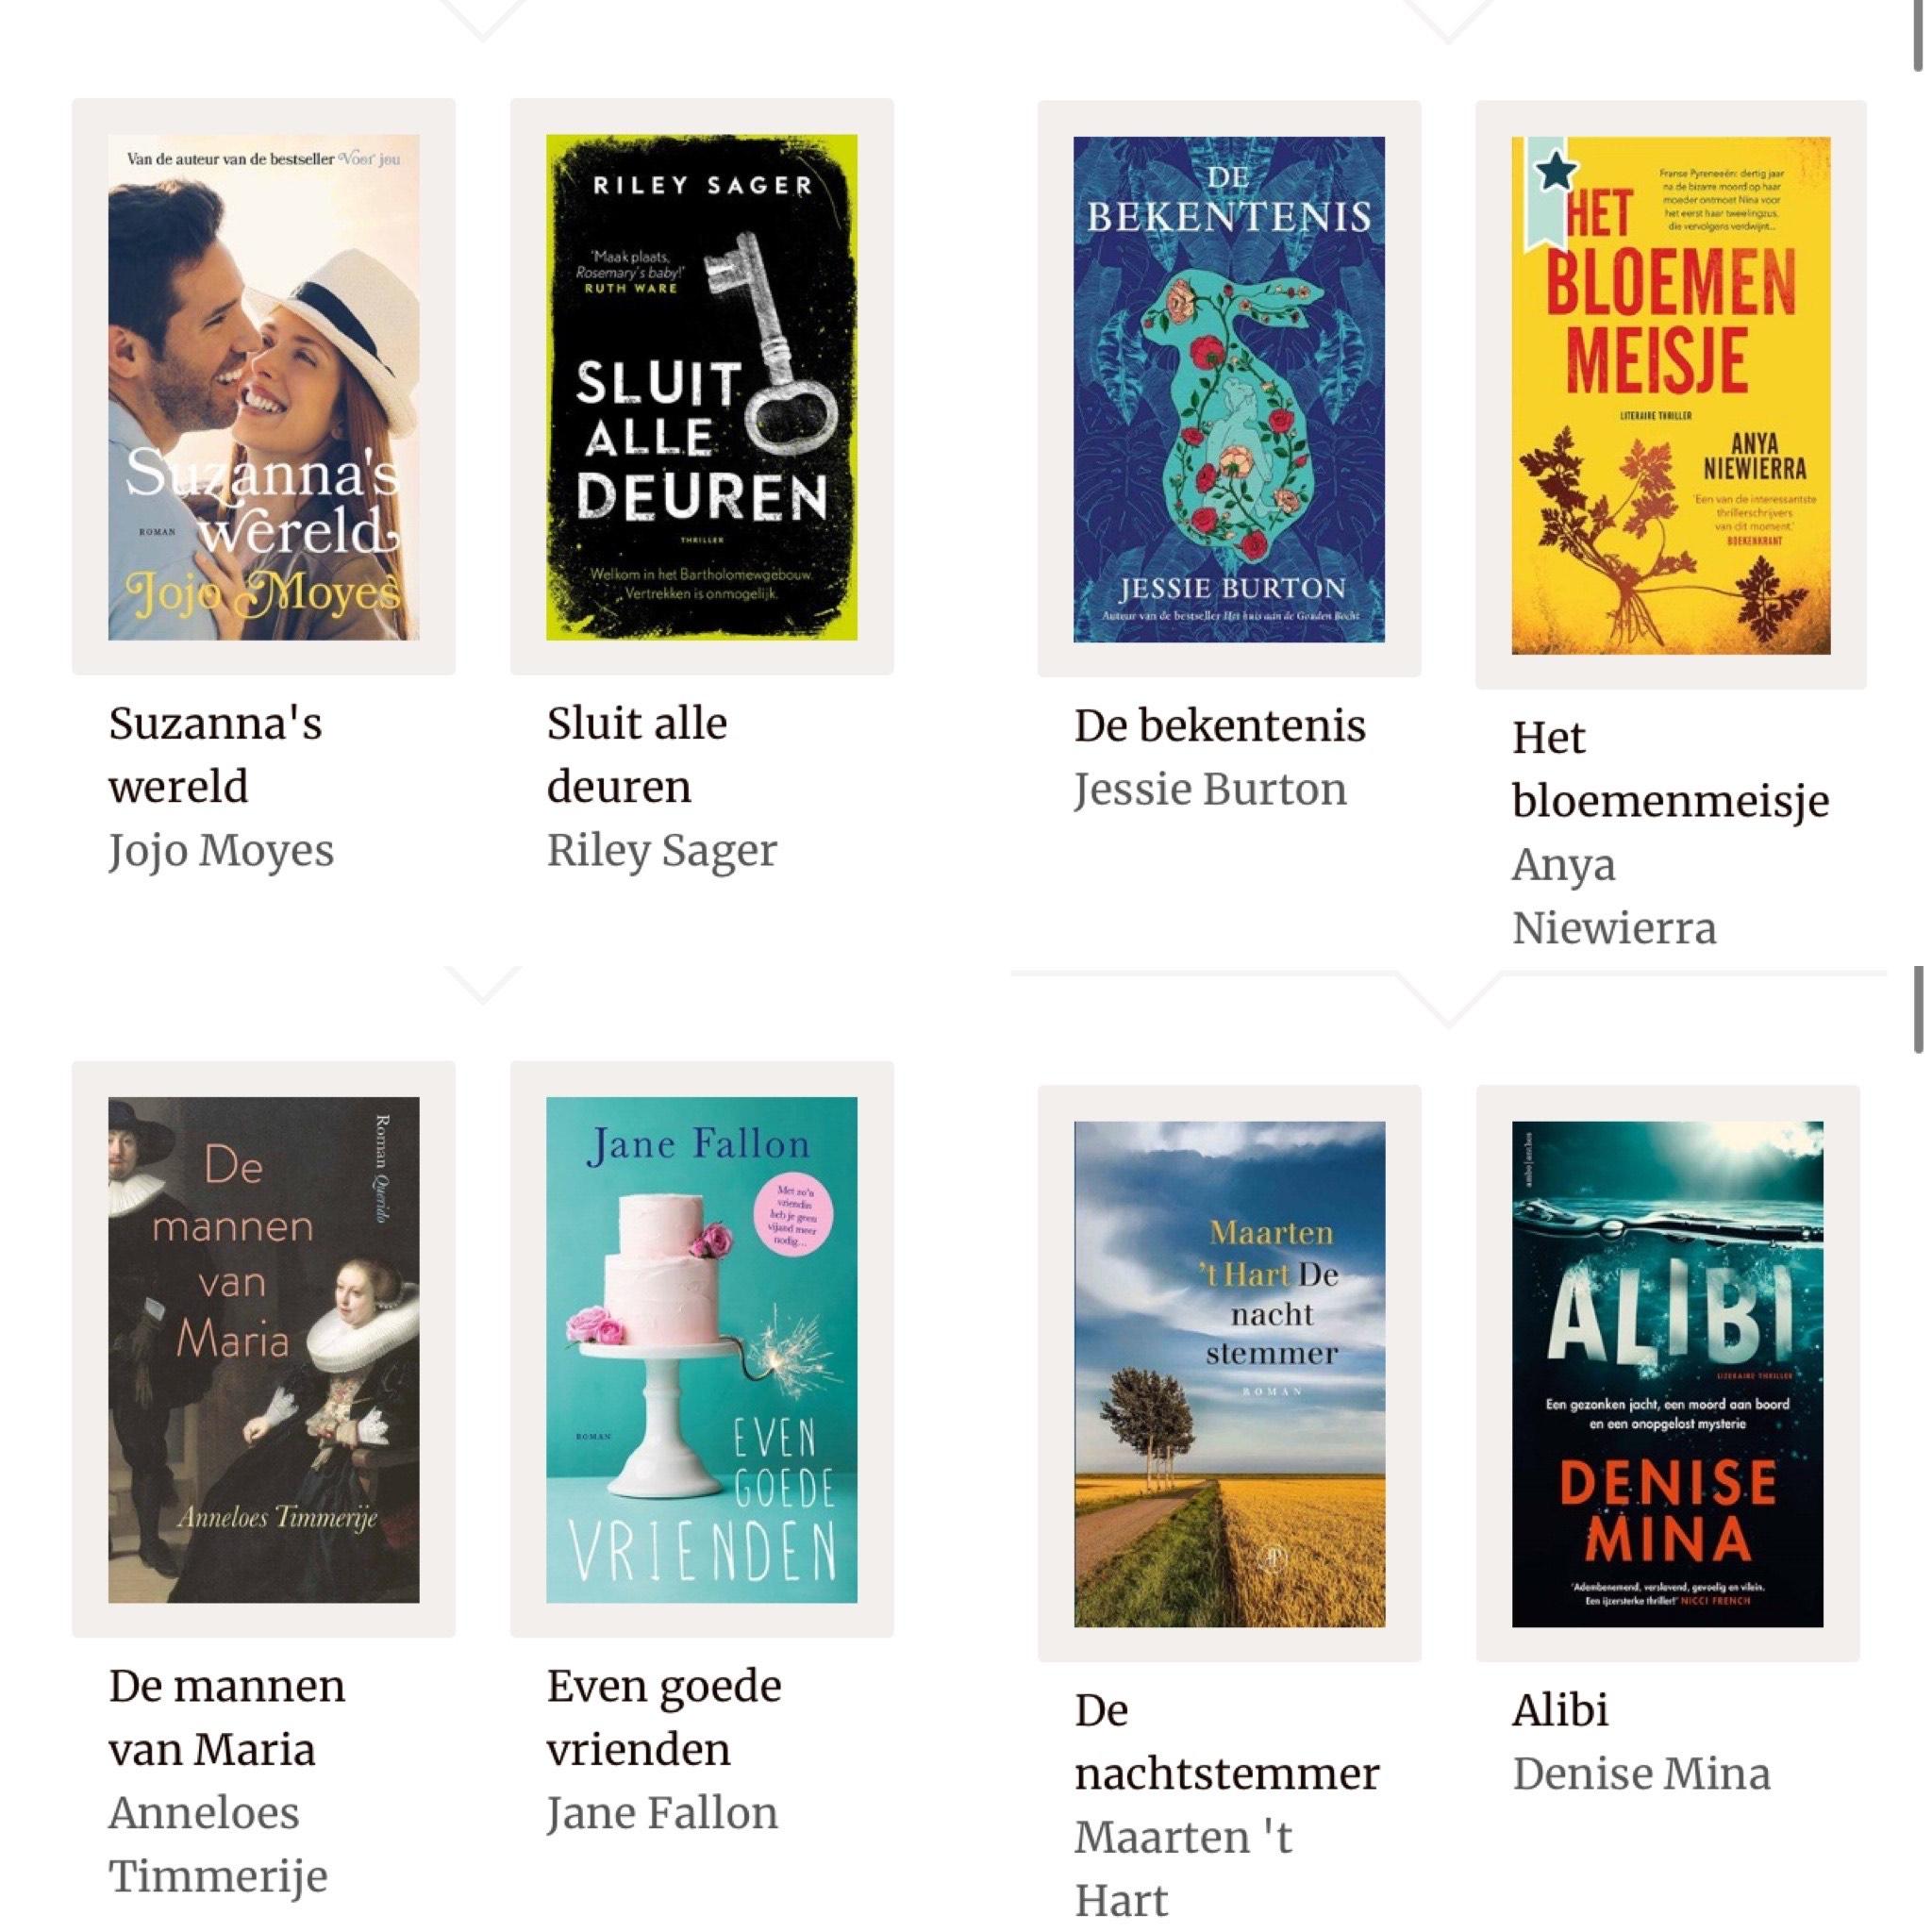 8 gratis ebooks / luisterboeken via bookchoice